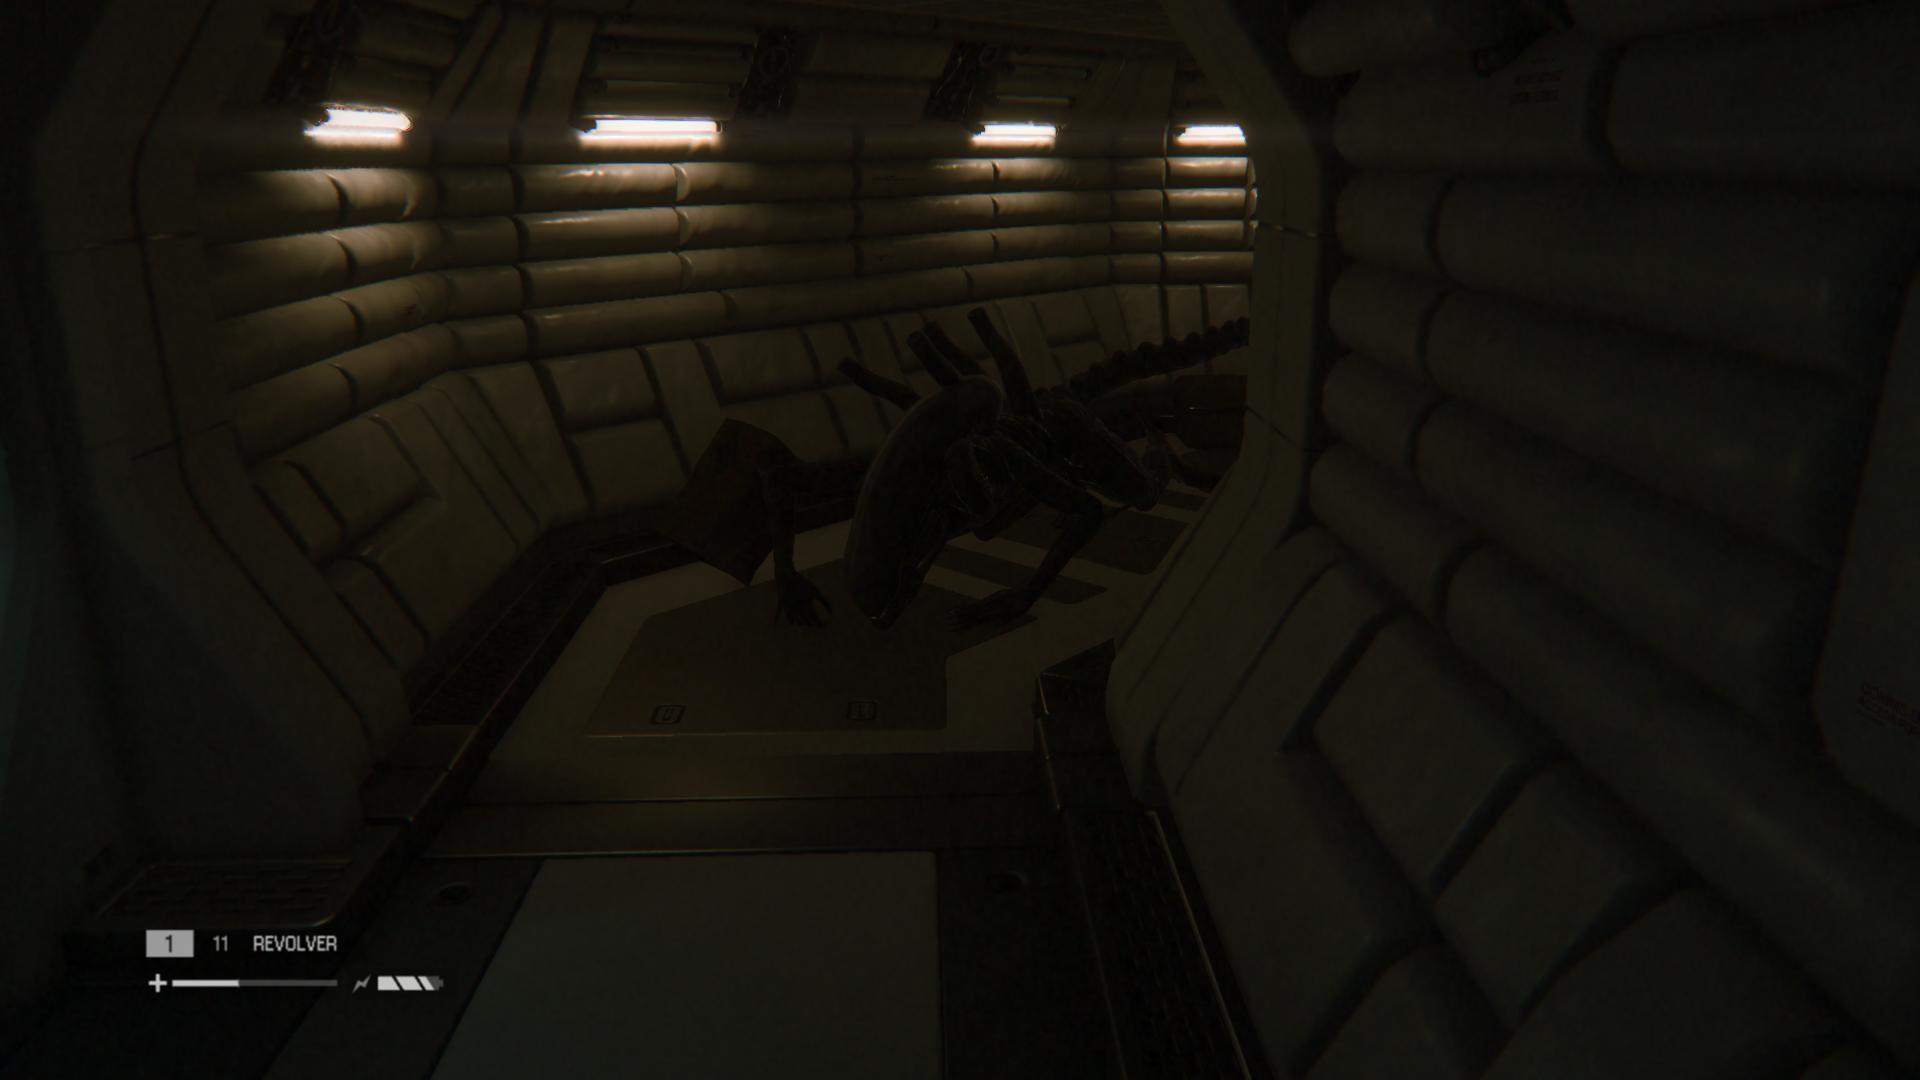 Recenze Alien: Isolation - Patnáct hodin v izolaci 9617